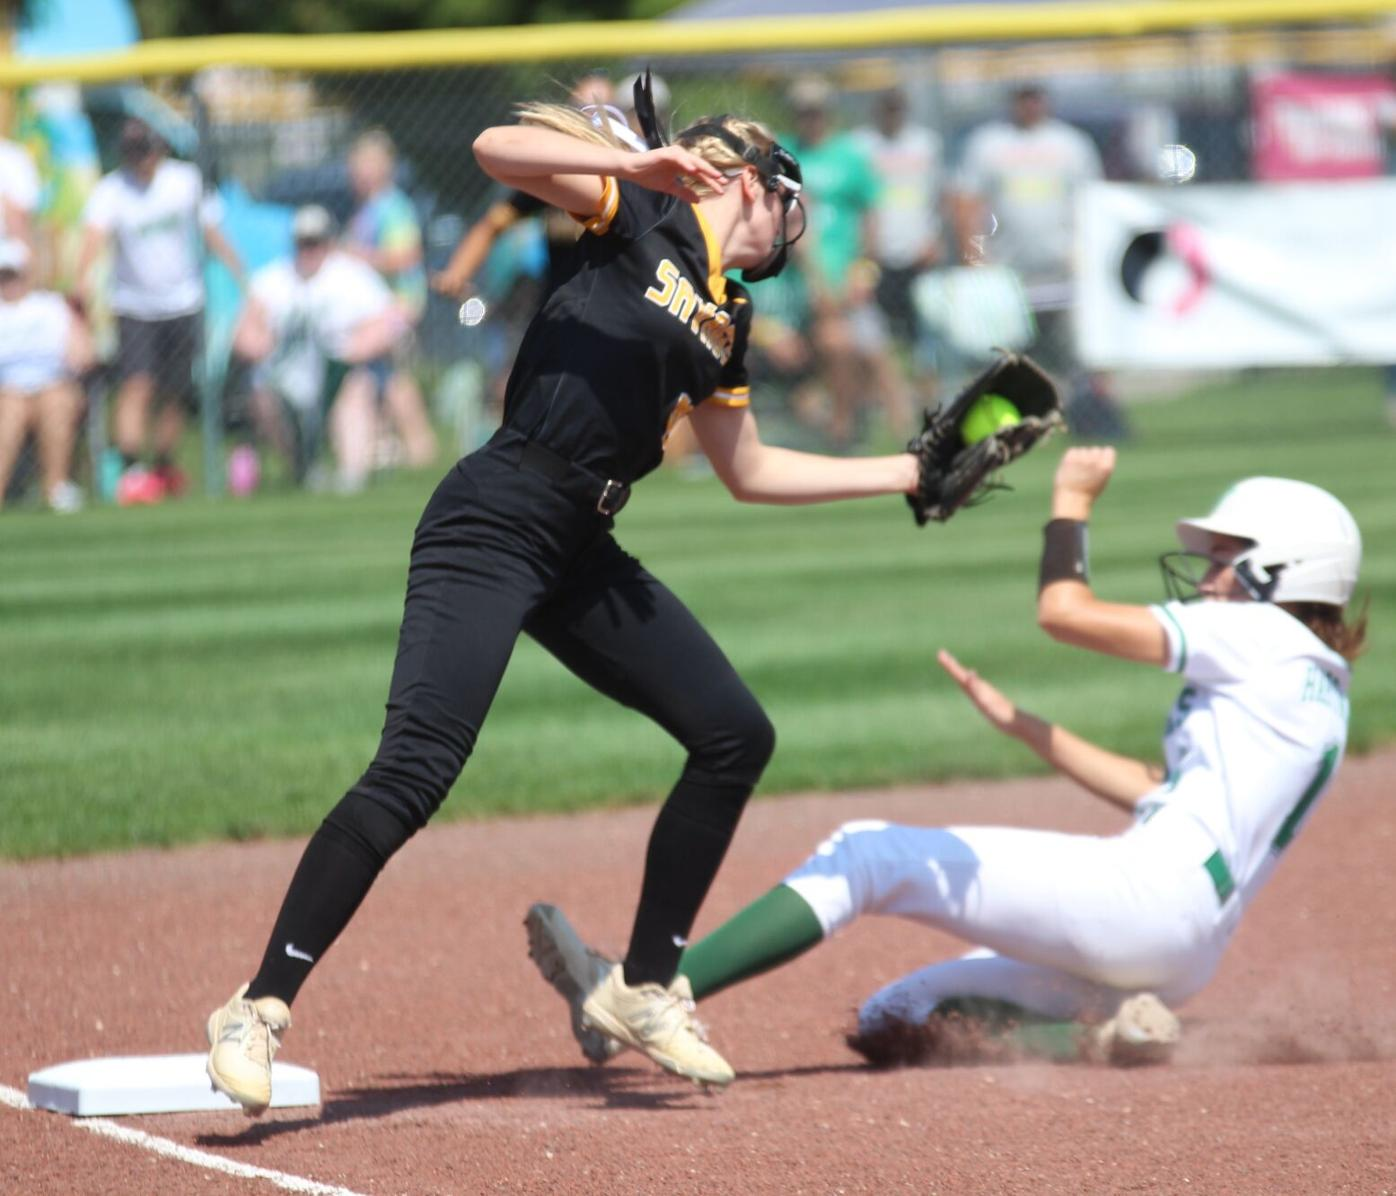 Nervous start costs Sigourney softball at state